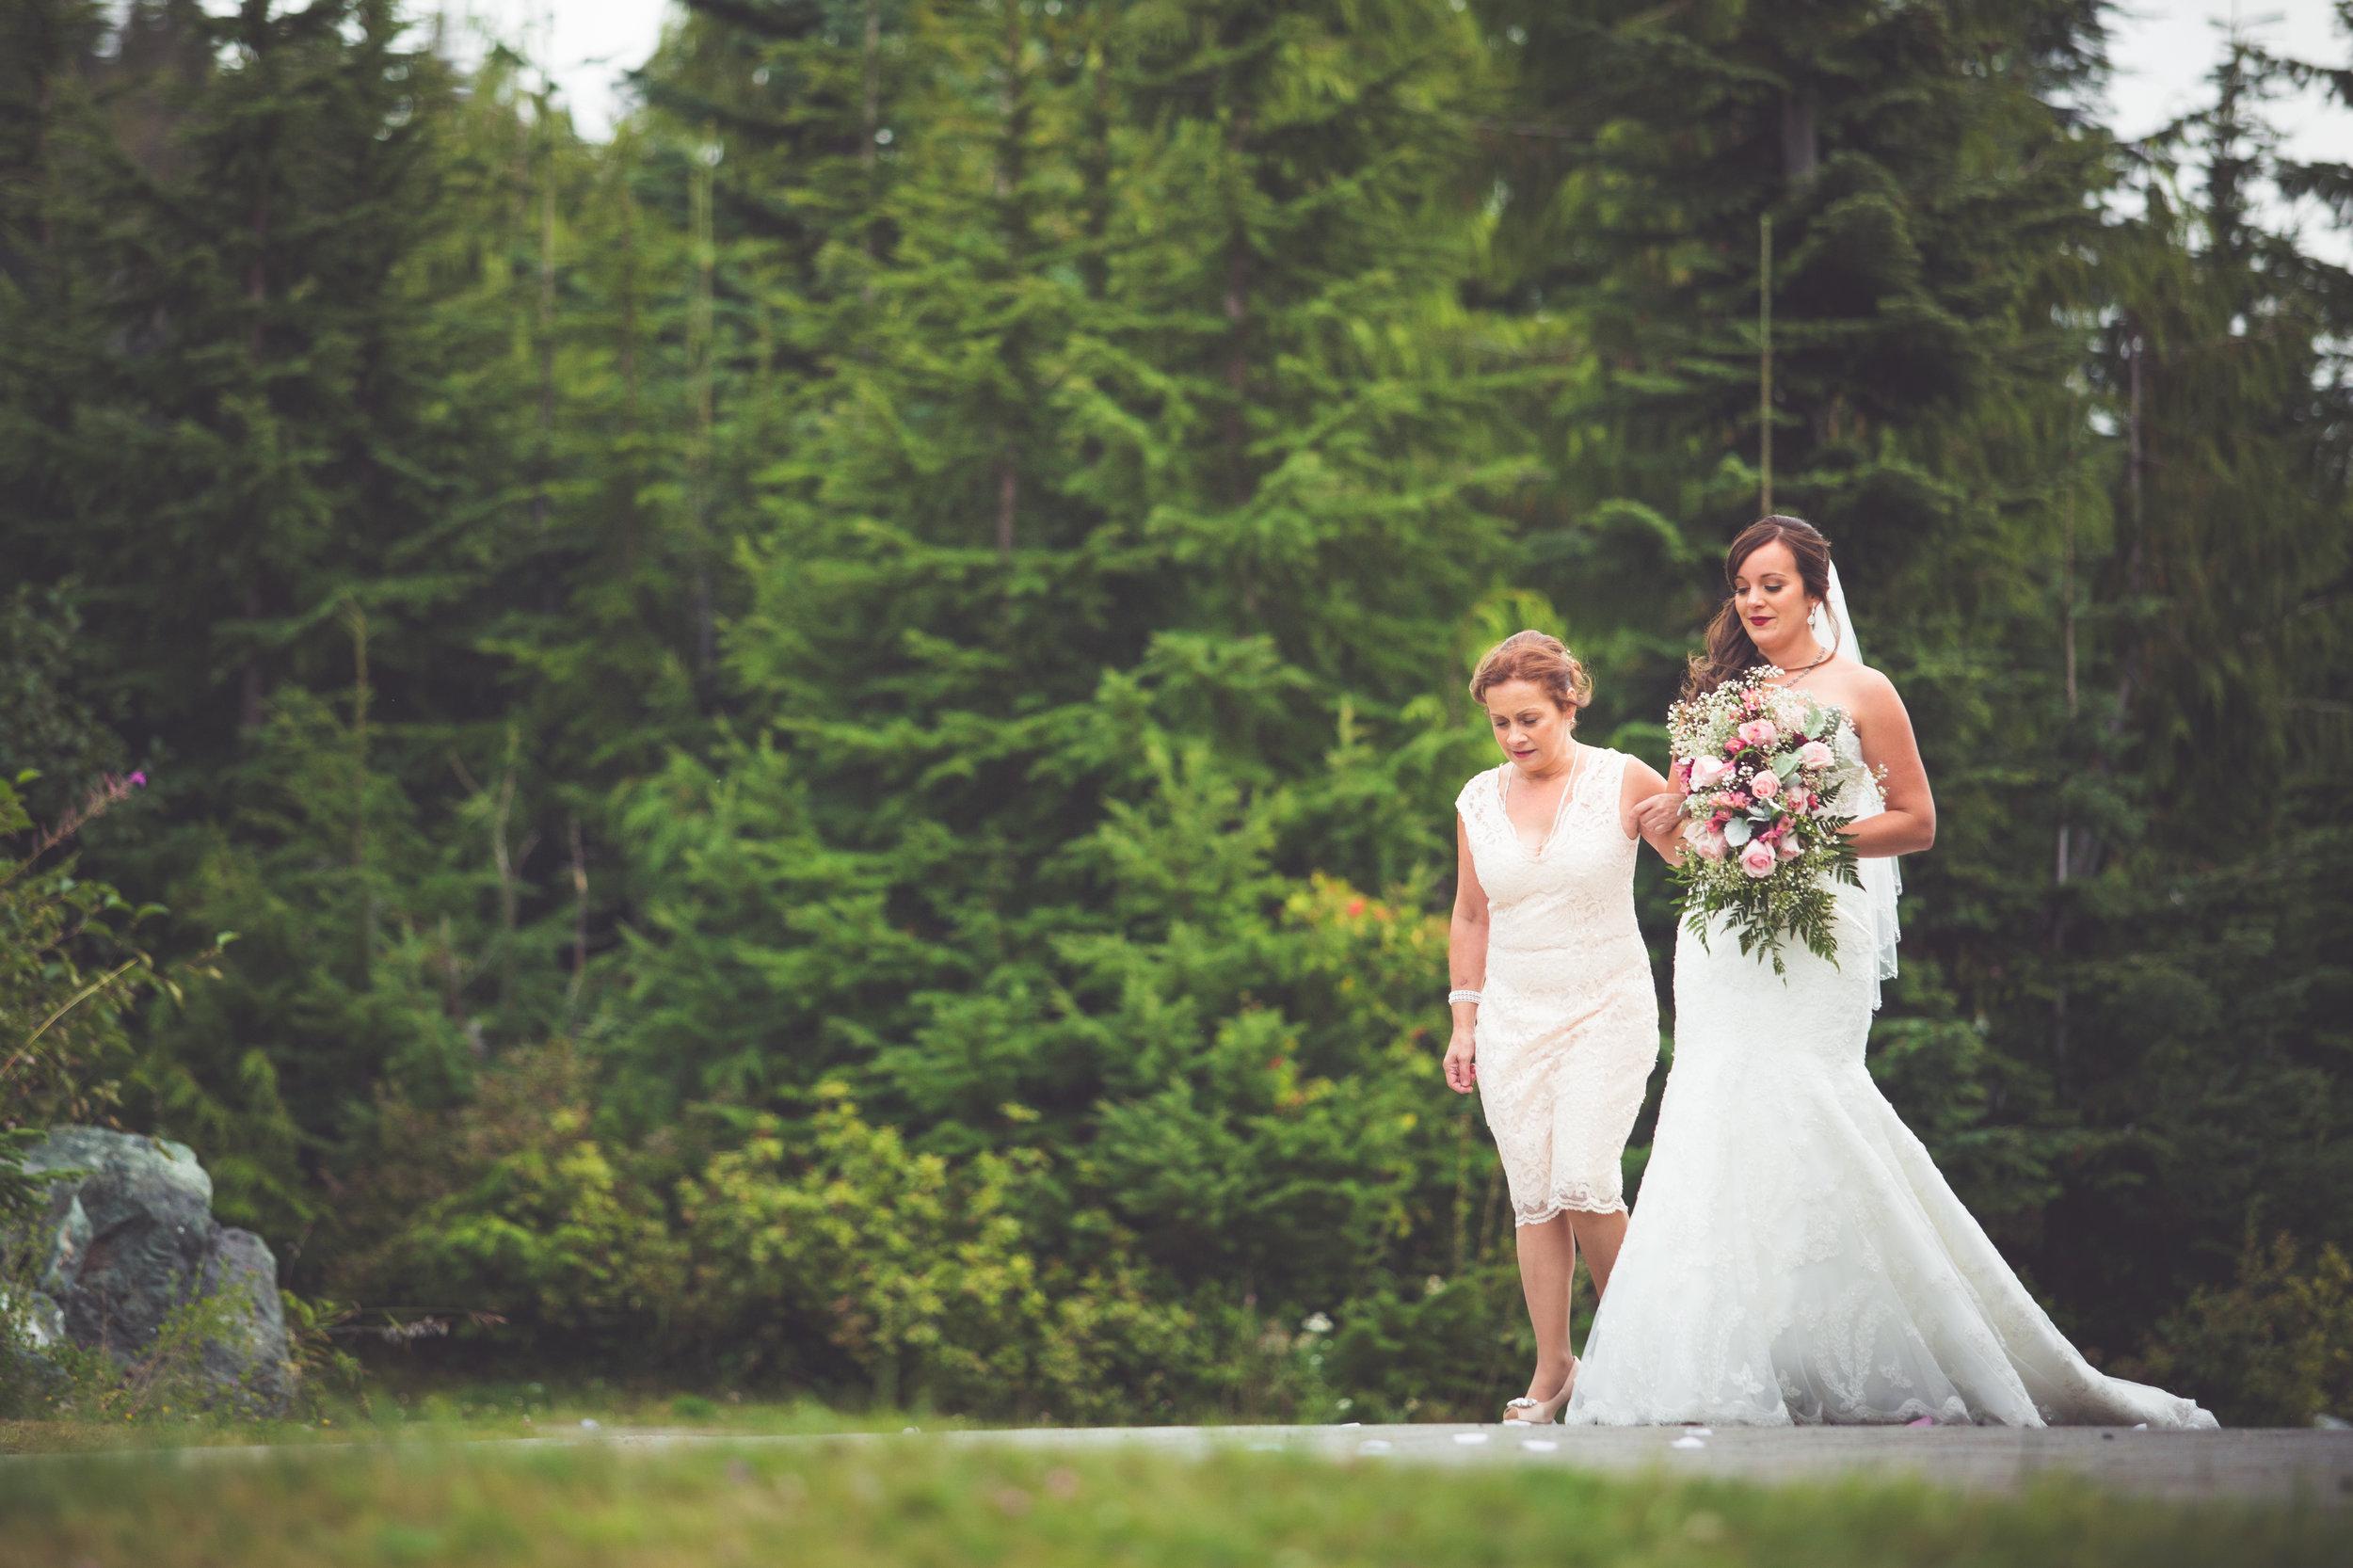 bride walks down aisle with mother at mount washington wedding